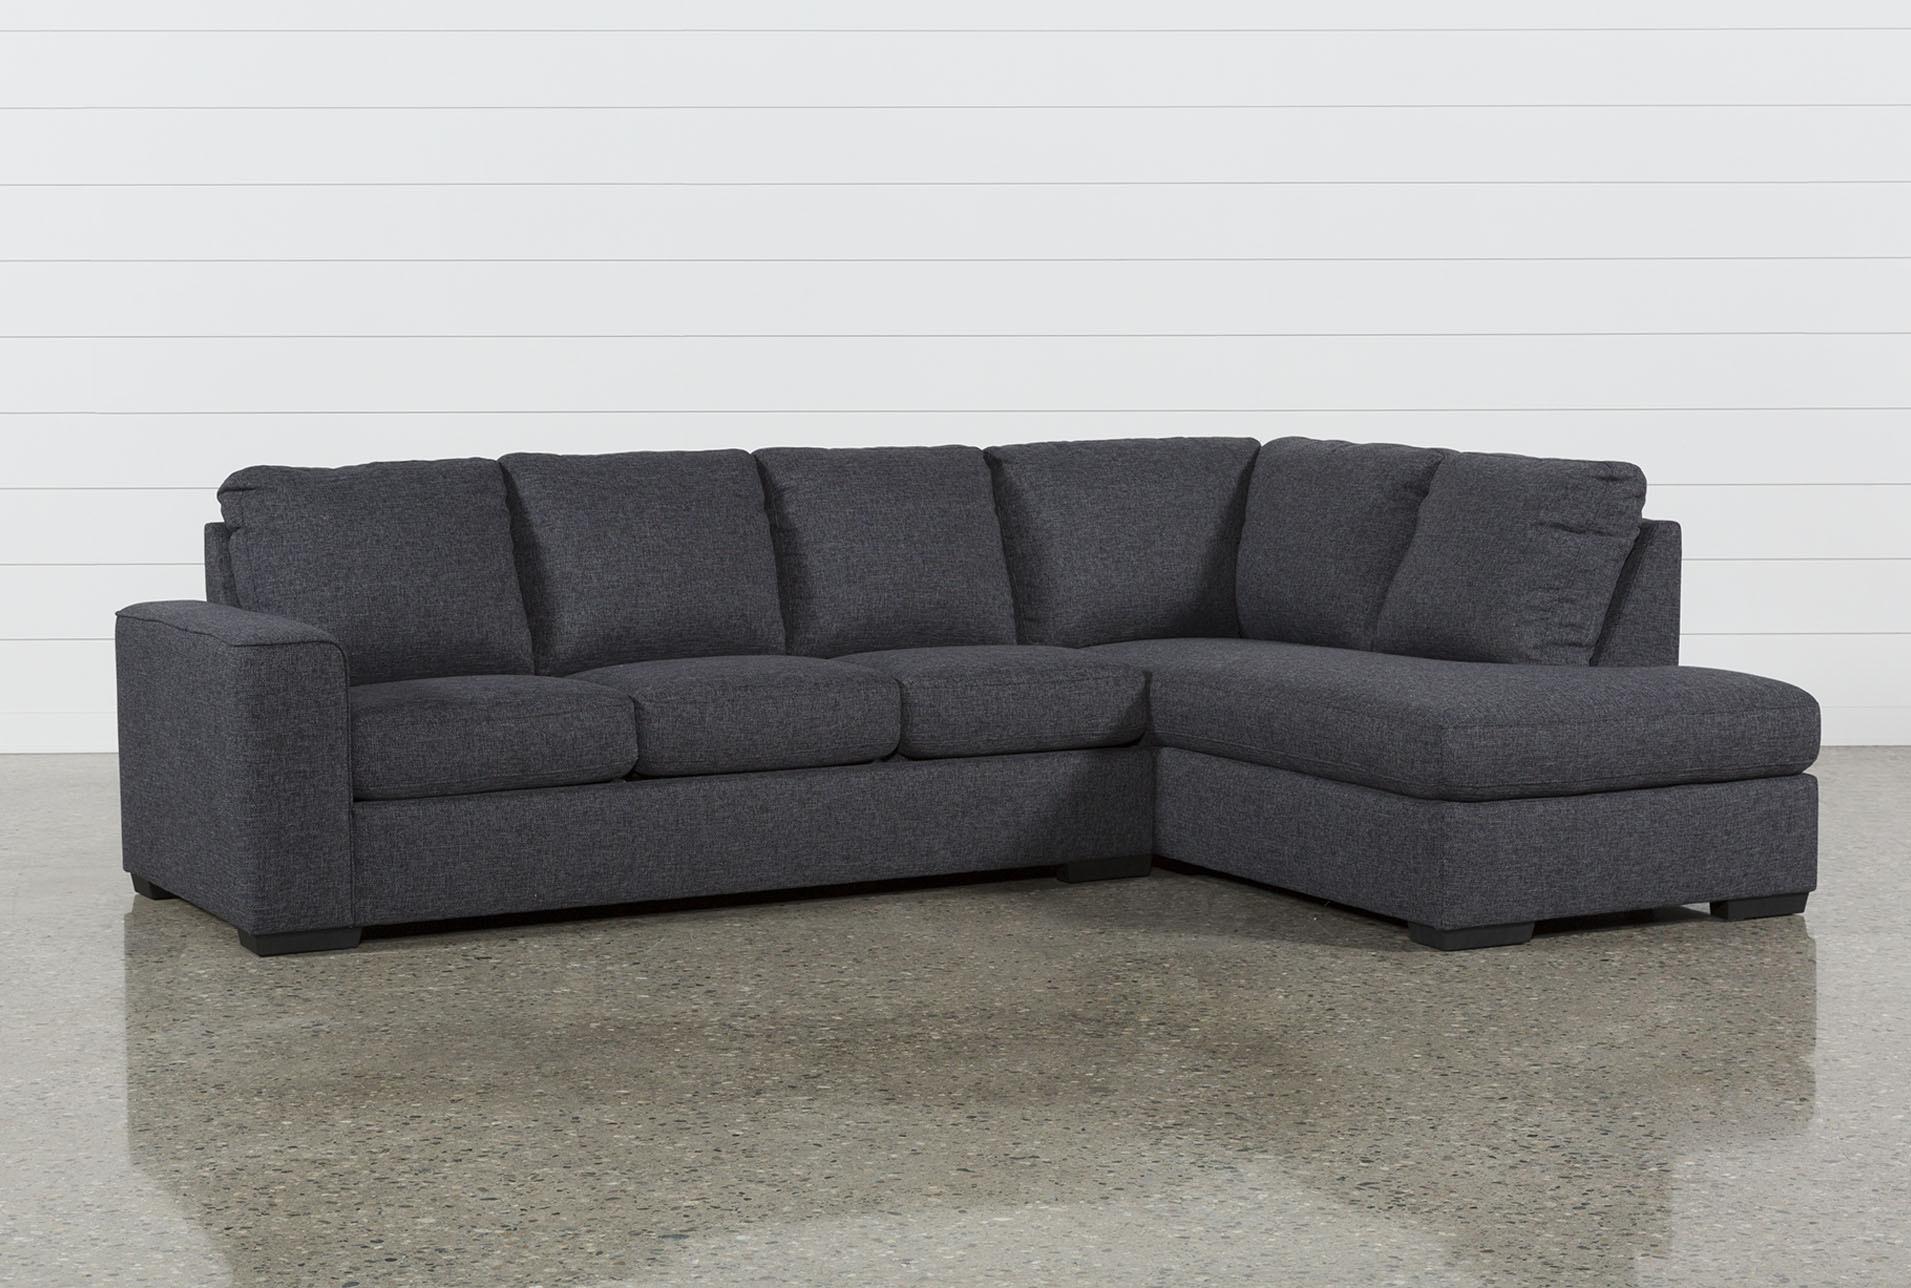 sleeper sectional sofa lucy dark grey 2 piece sleeper sectional w/raf chaise HSSIAFP